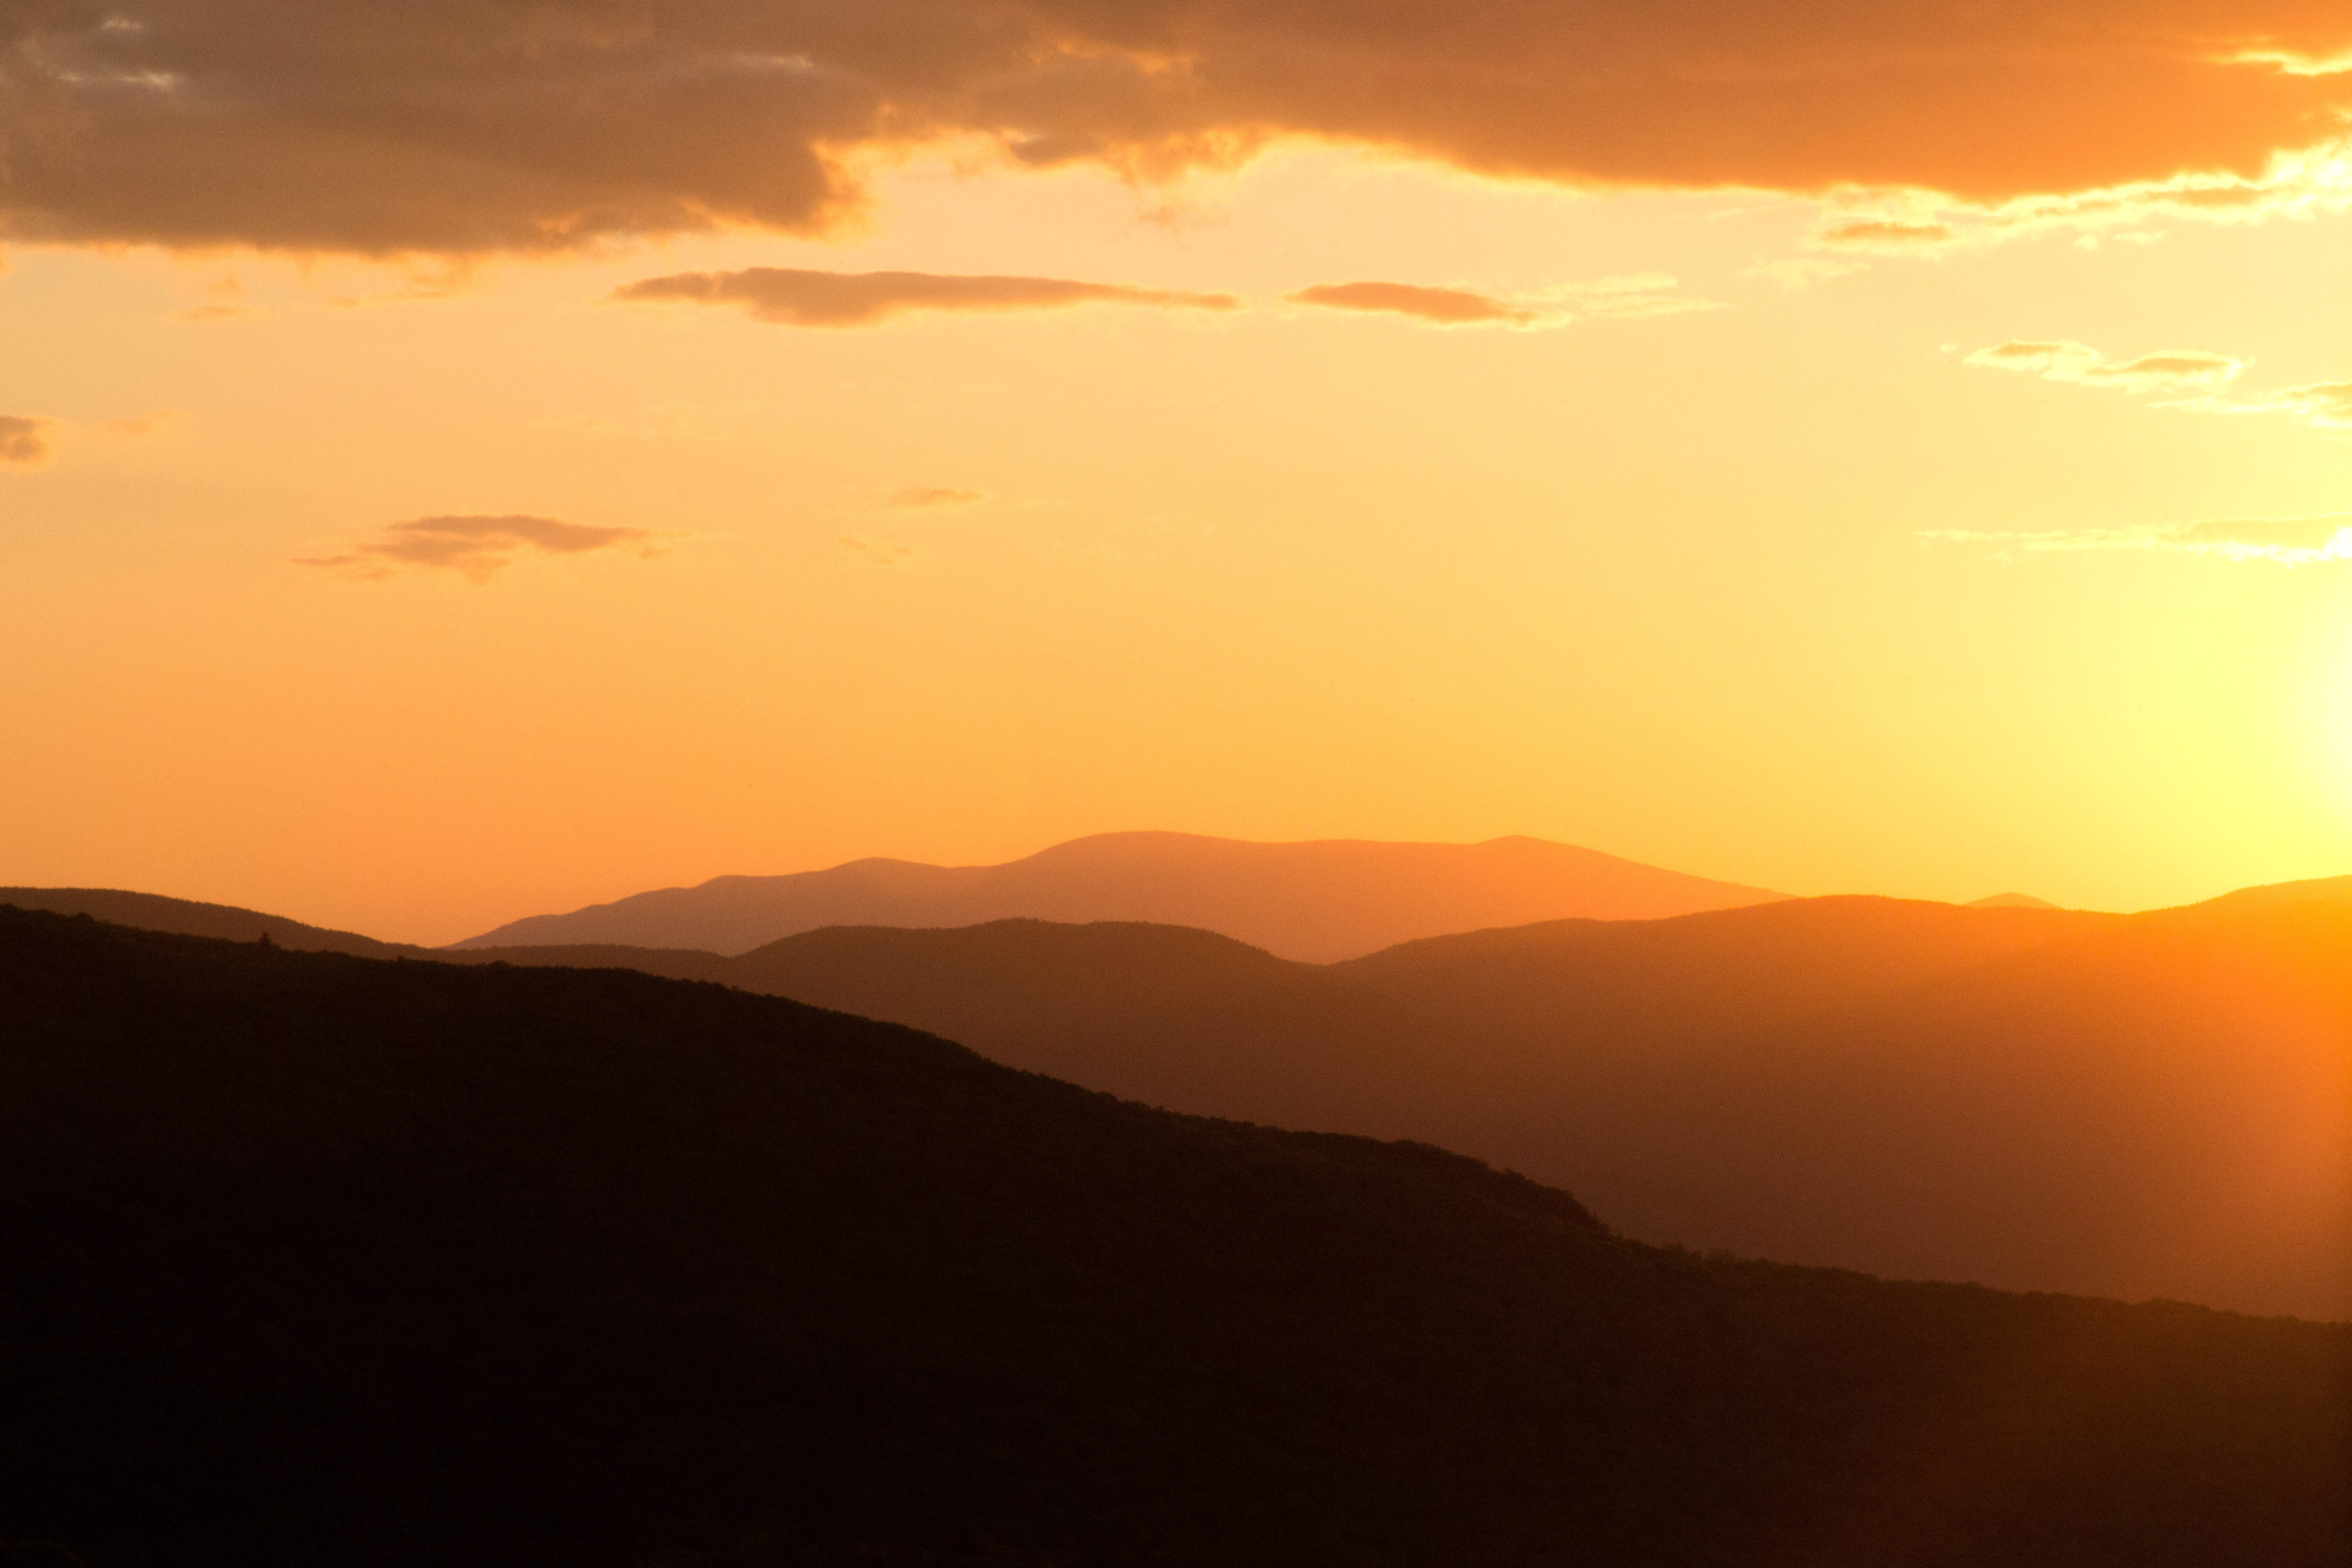 Free picture: onrage sunset, dusk, hills, sunset ...